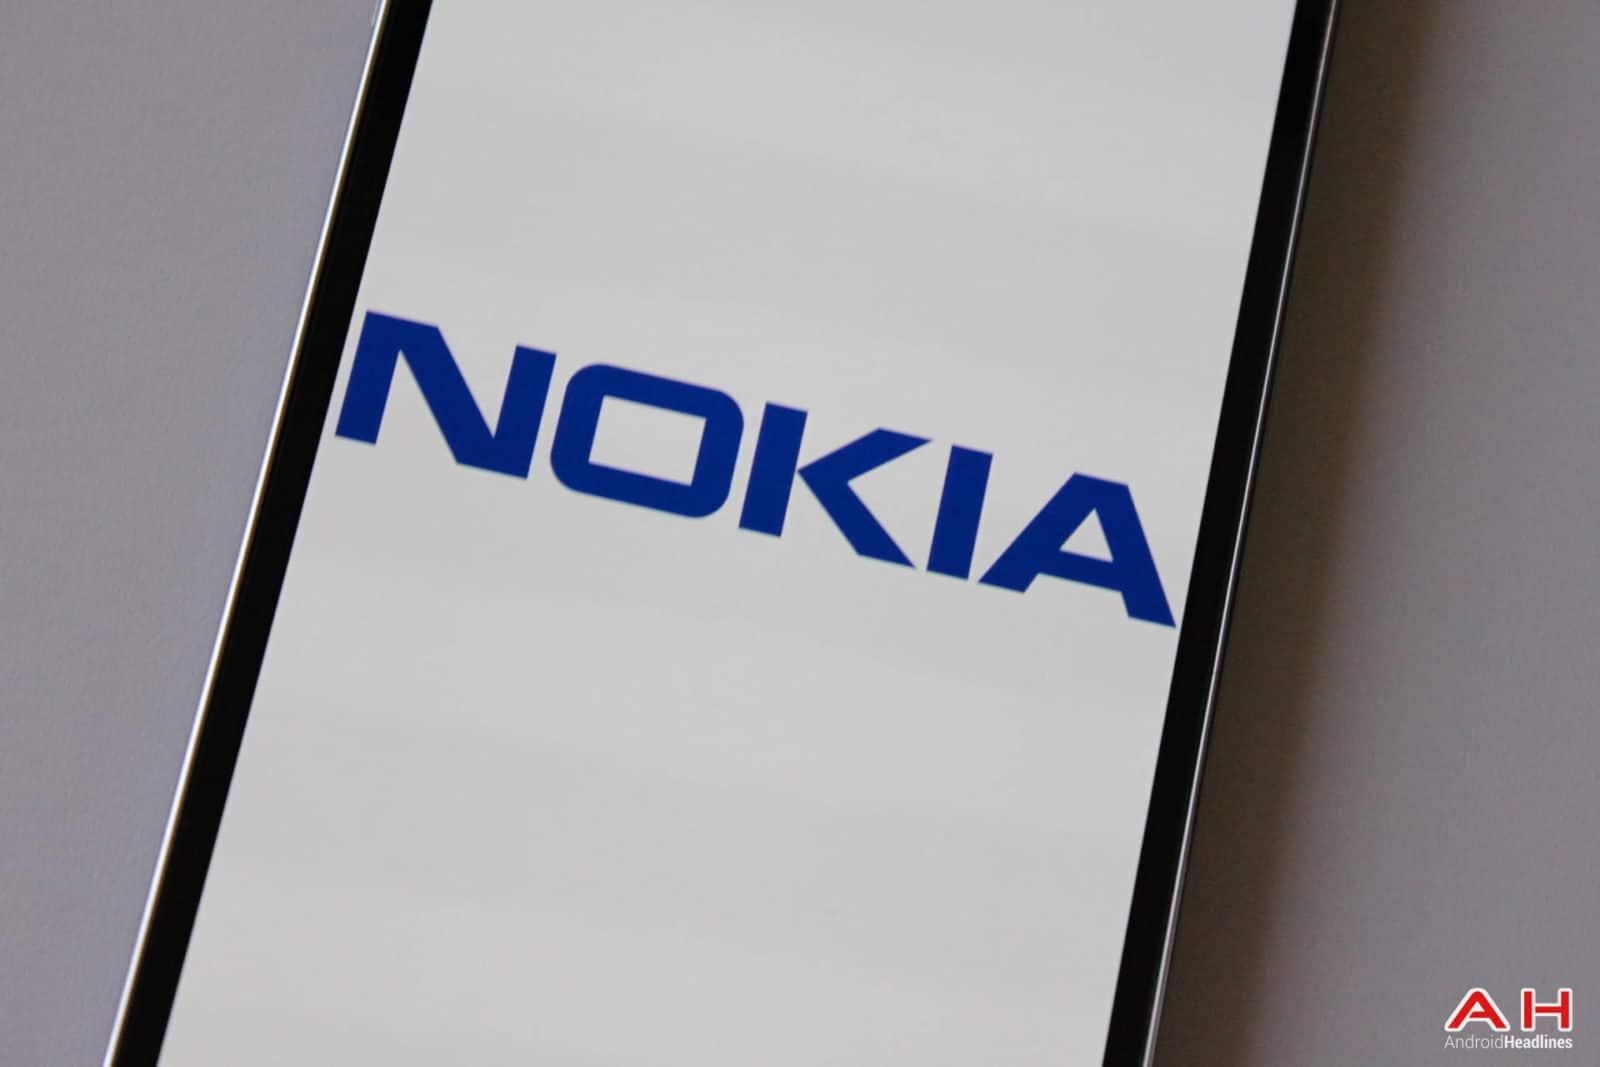 AH NOKia Logo 1.0